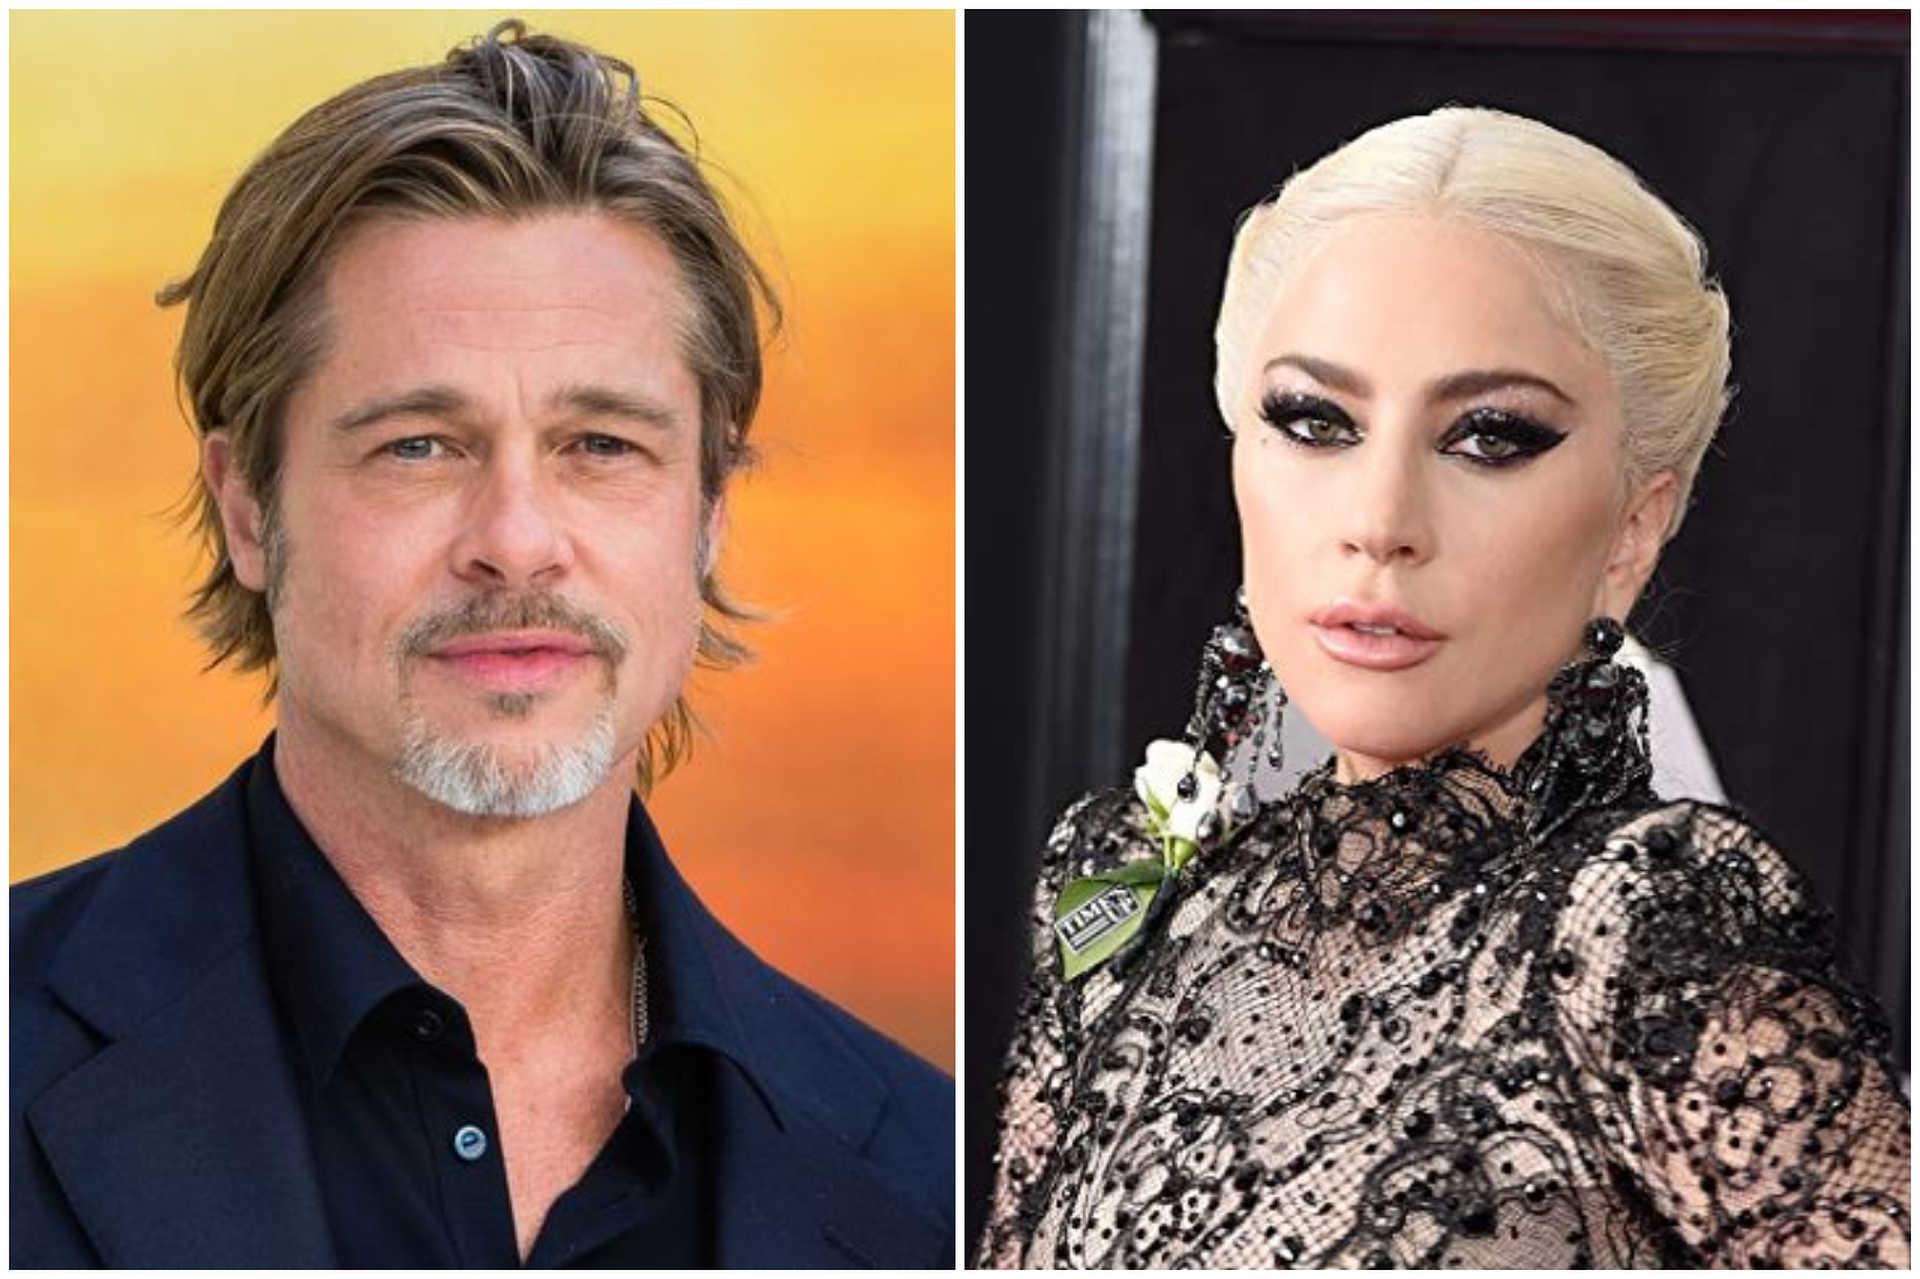 Brad Pitt & Lady Gaga